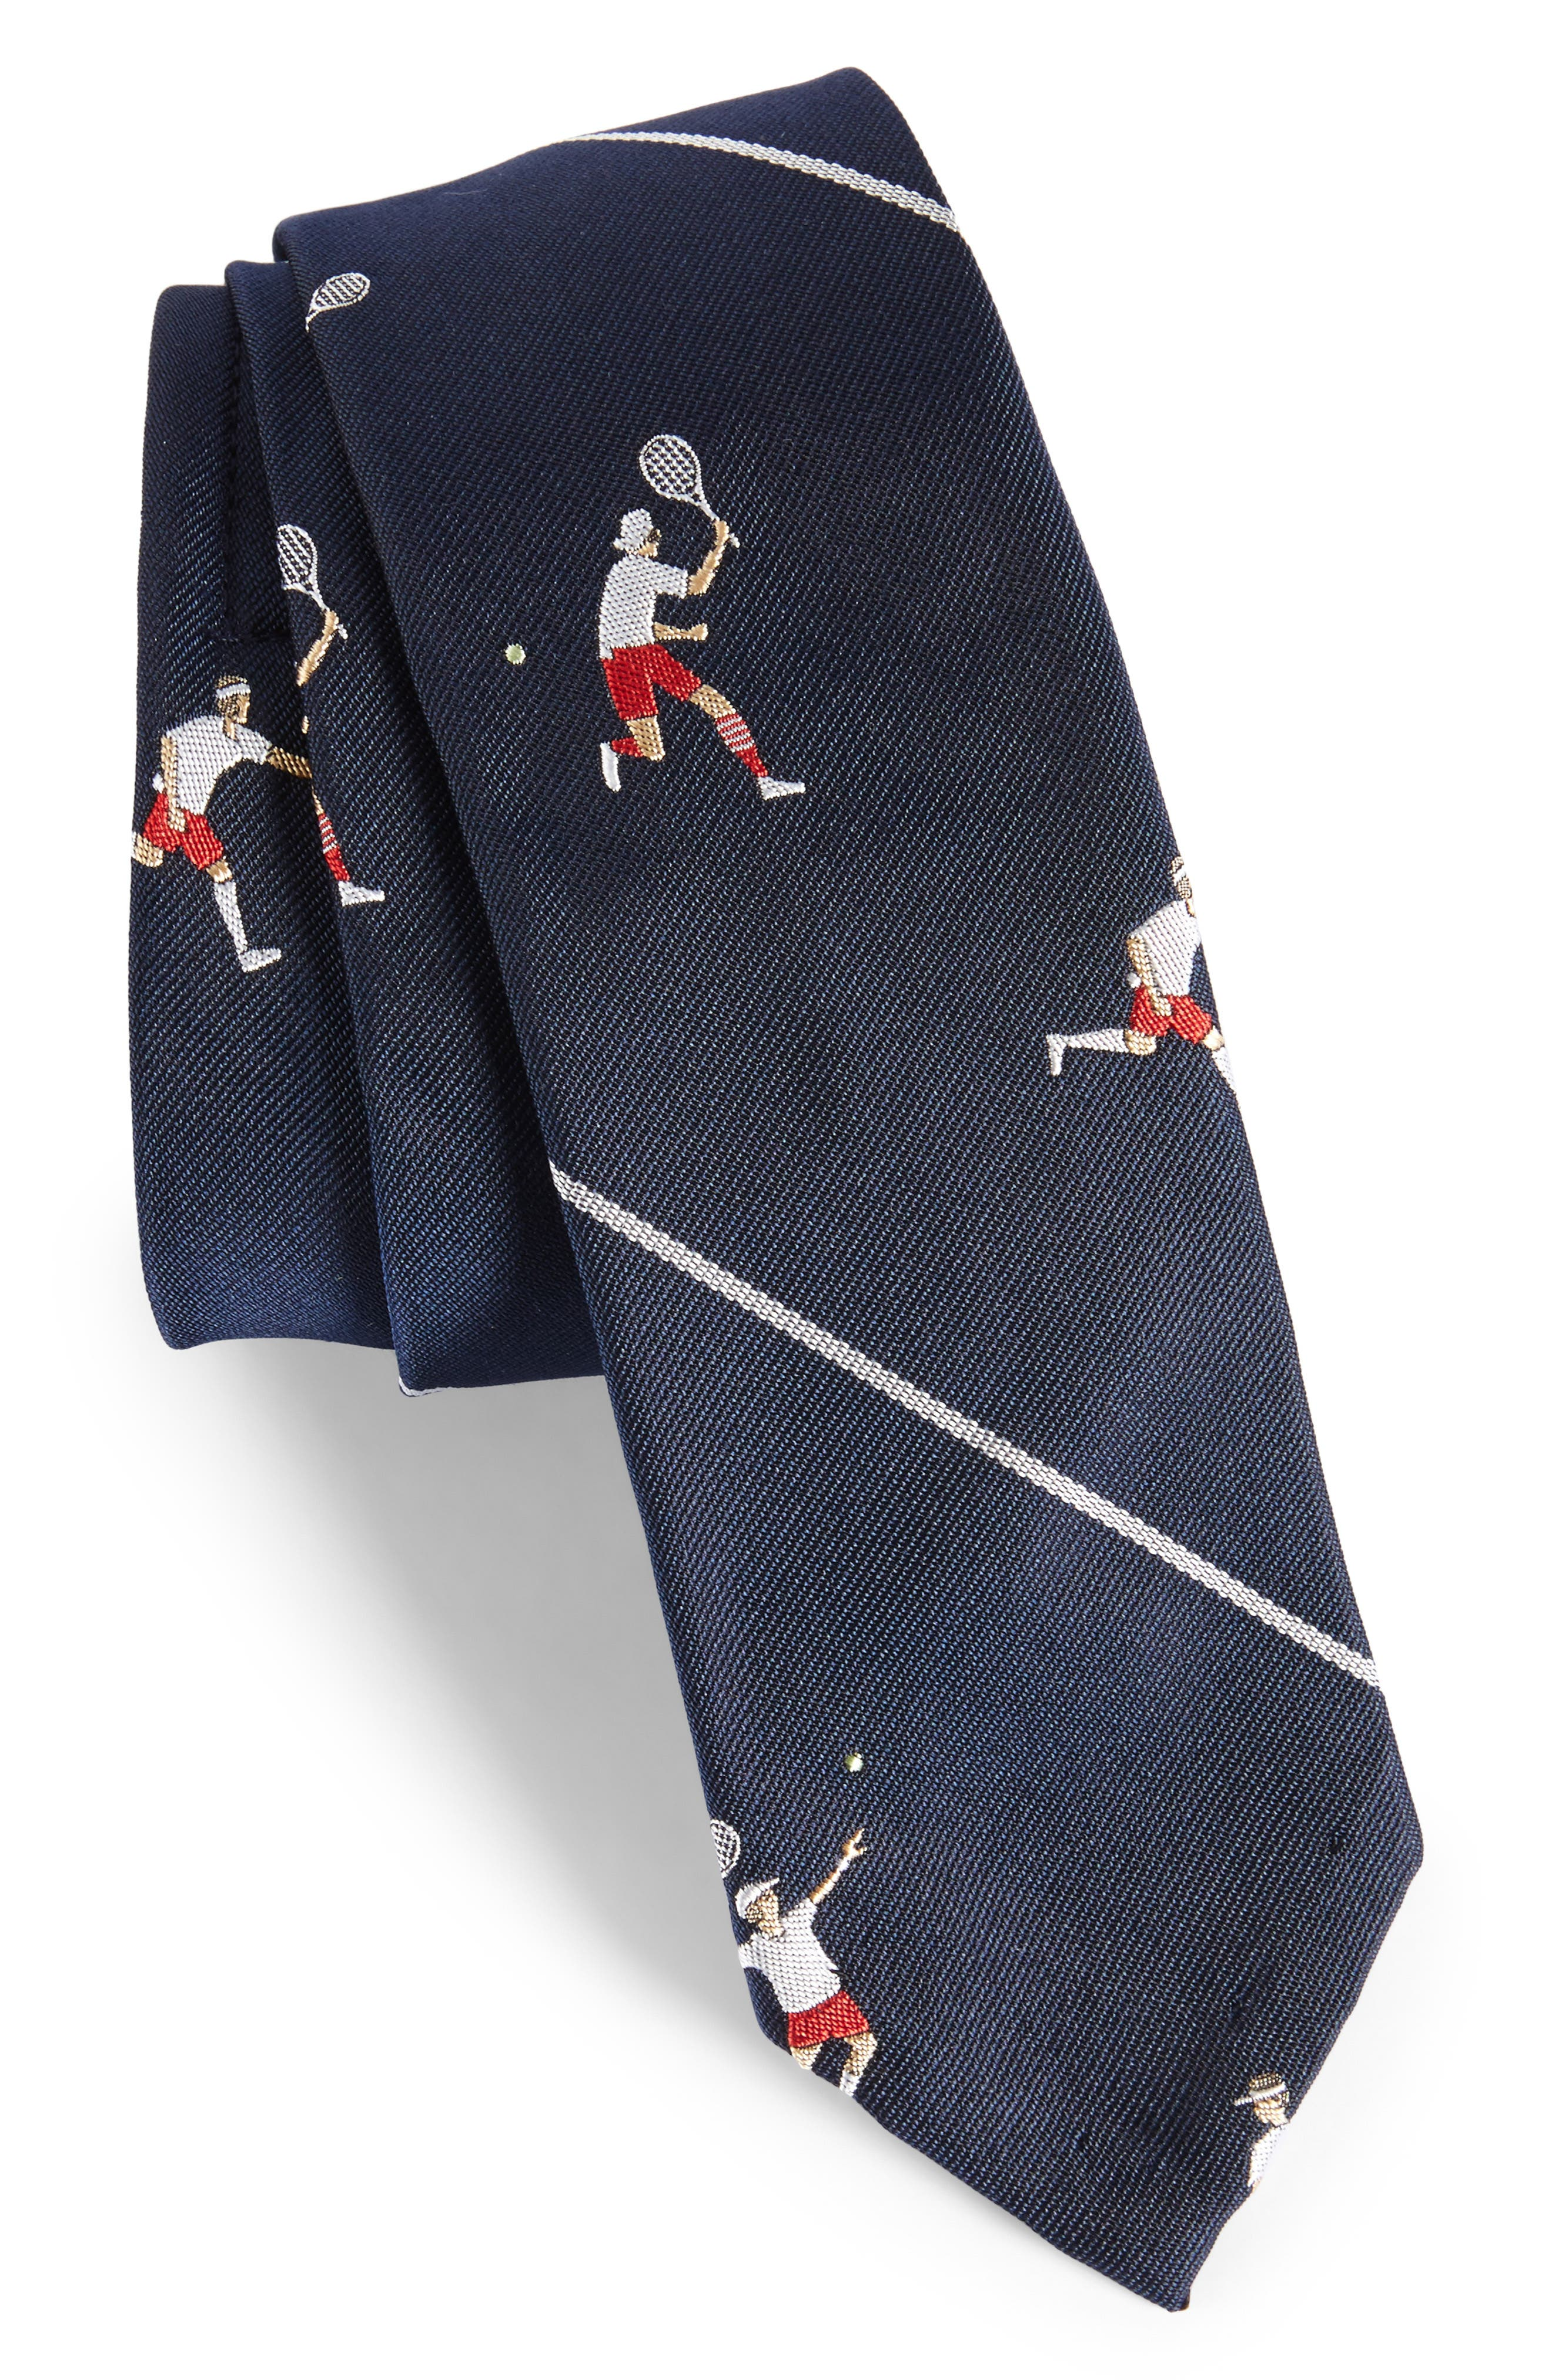 Tennis Player Silk Skinny Tie,                             Main thumbnail 1, color,                             Navy